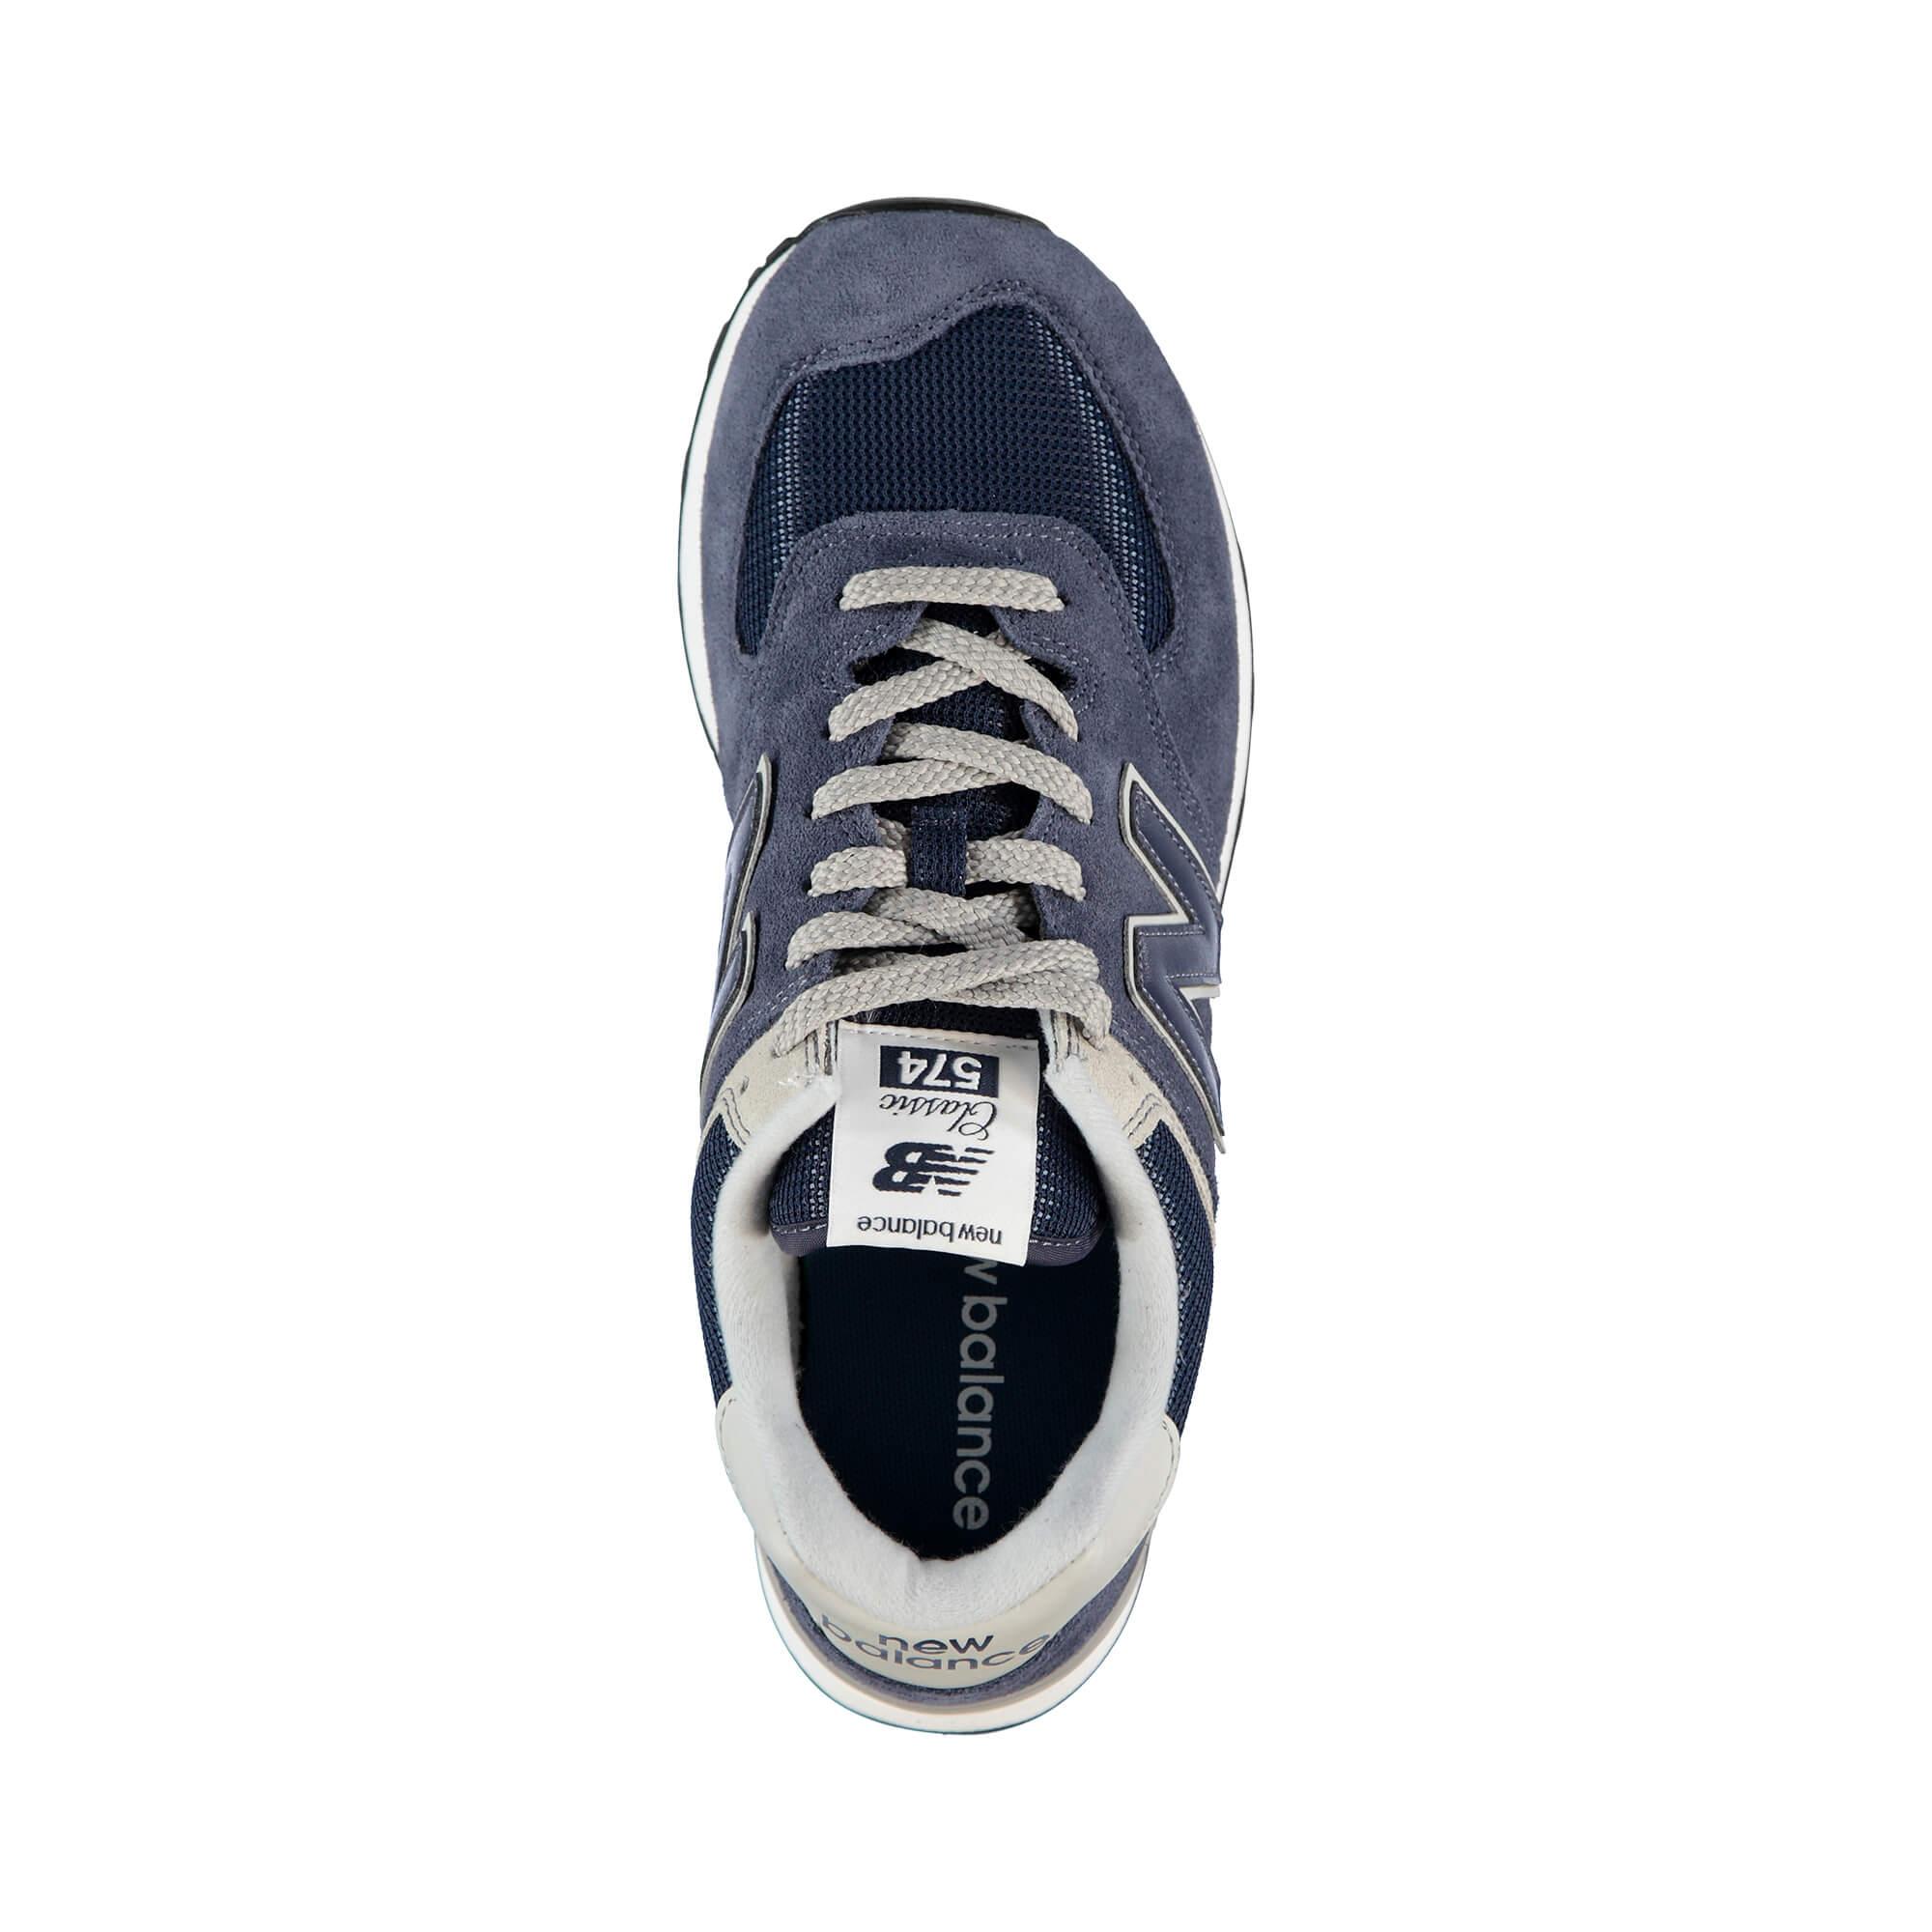 New Balance 575 Evergreen Erkek Lacivert Sneaker